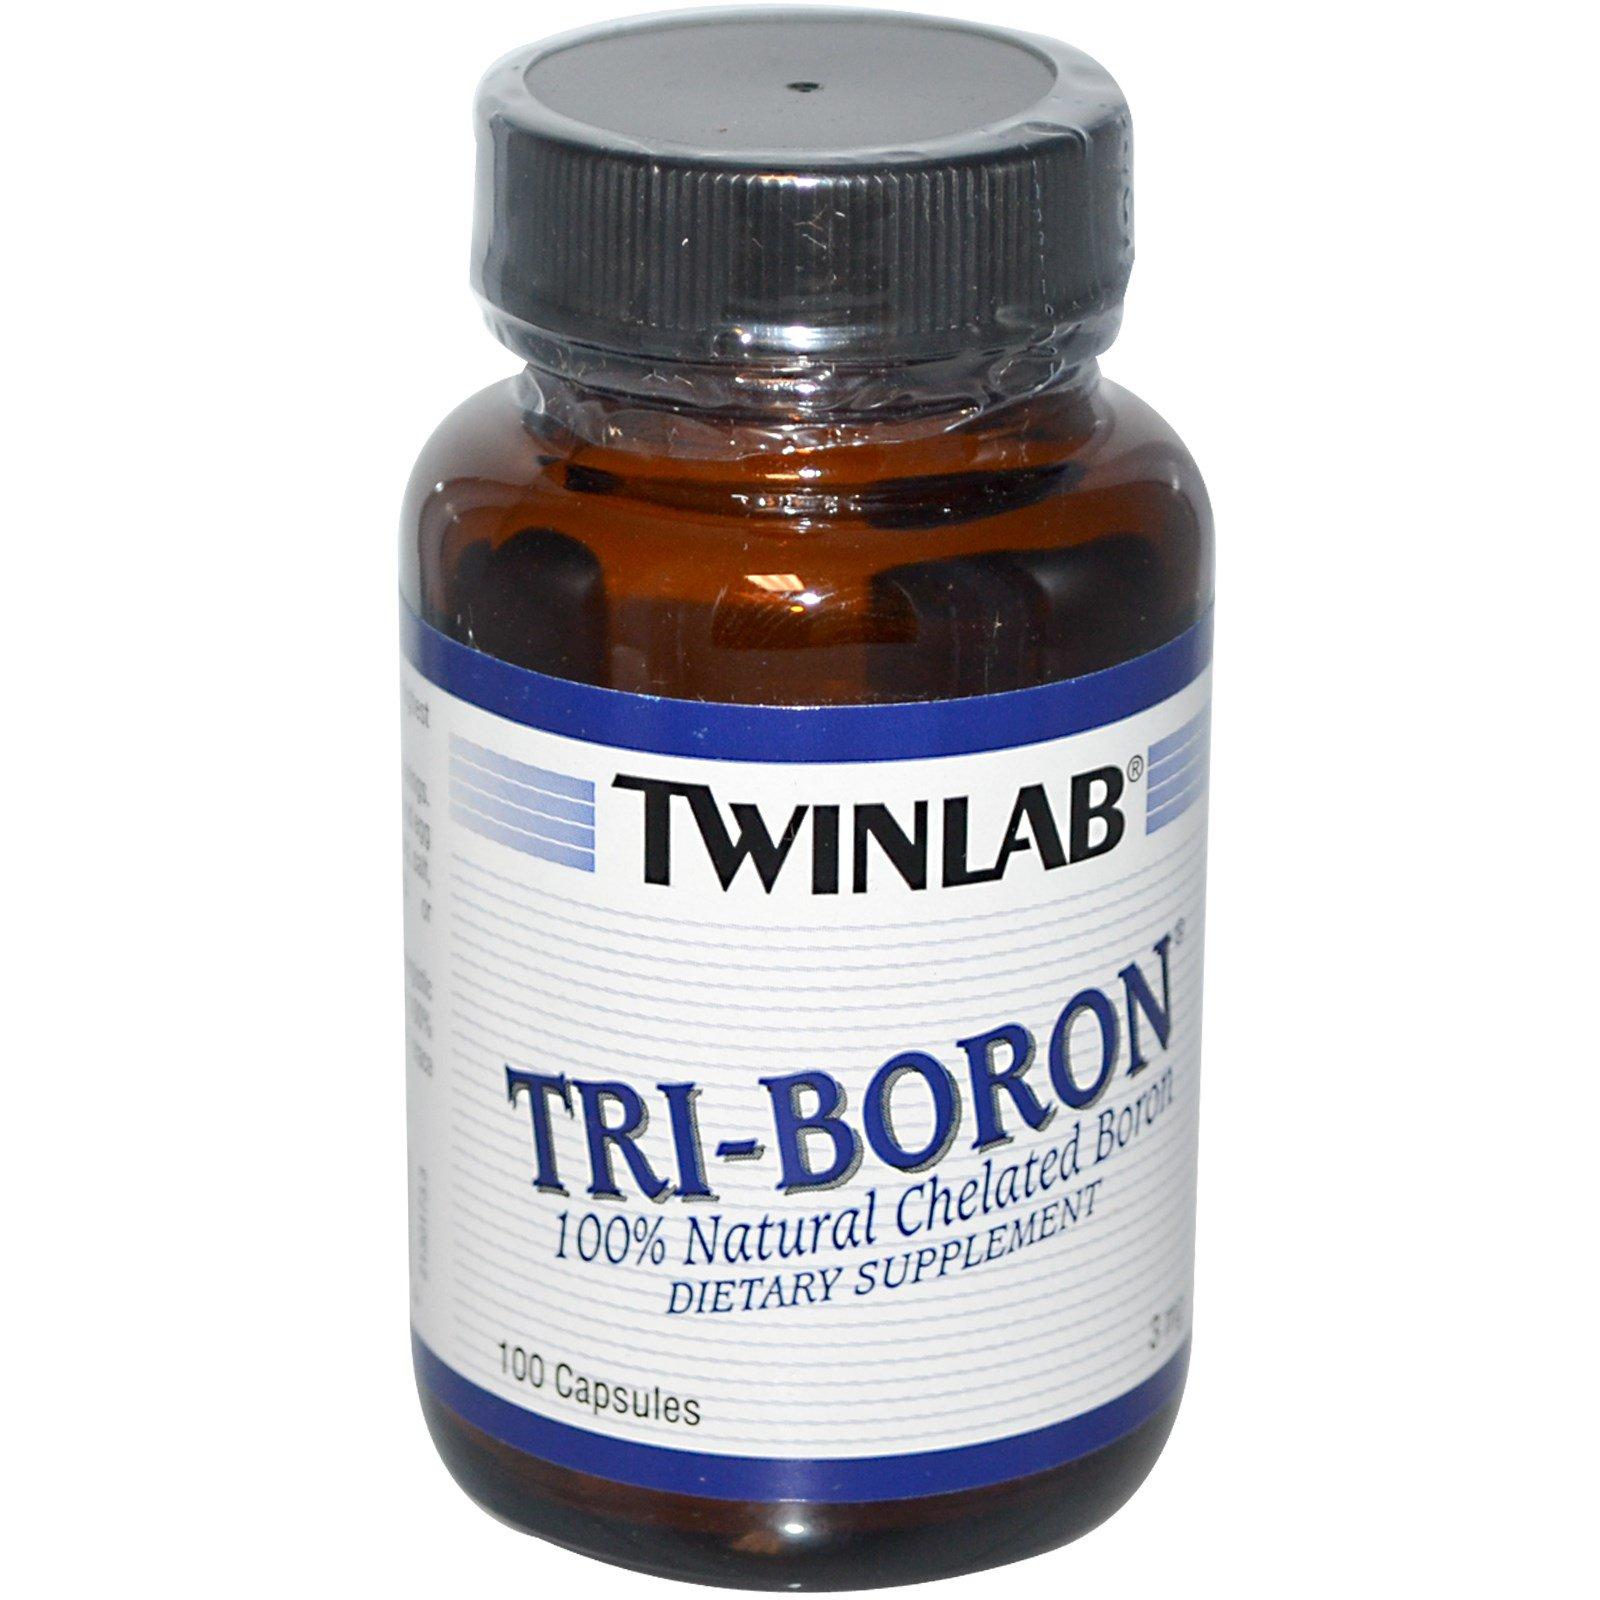 Twinlab, Тройной бор, 3 мг, 100 капсул